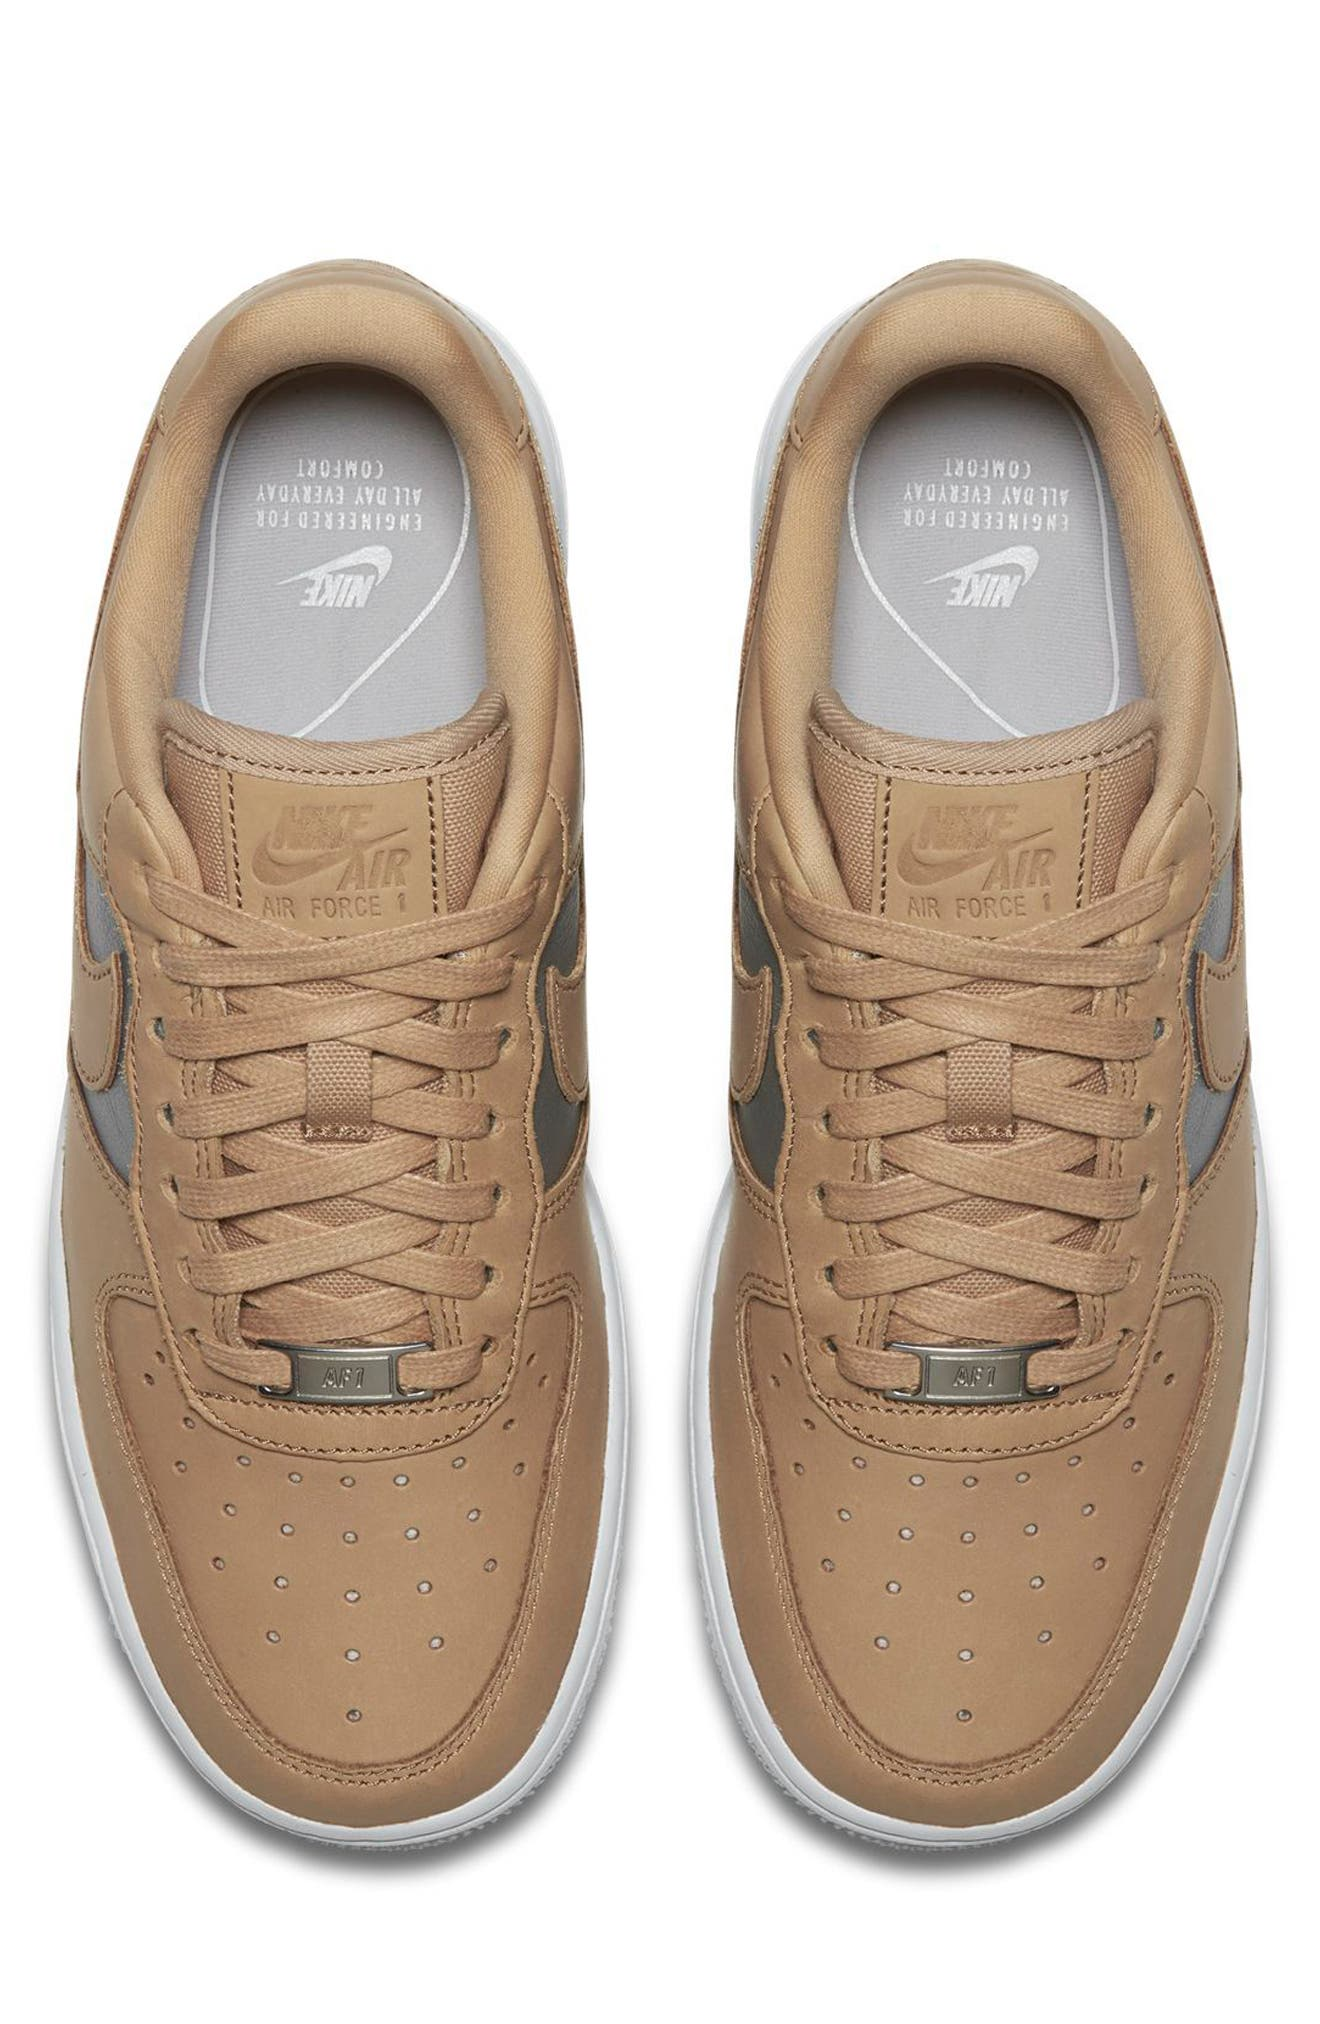 Air Force 1 '07 SE Premium Sneaker,                             Alternate thumbnail 4, color,                             Beige/ Silver/ White